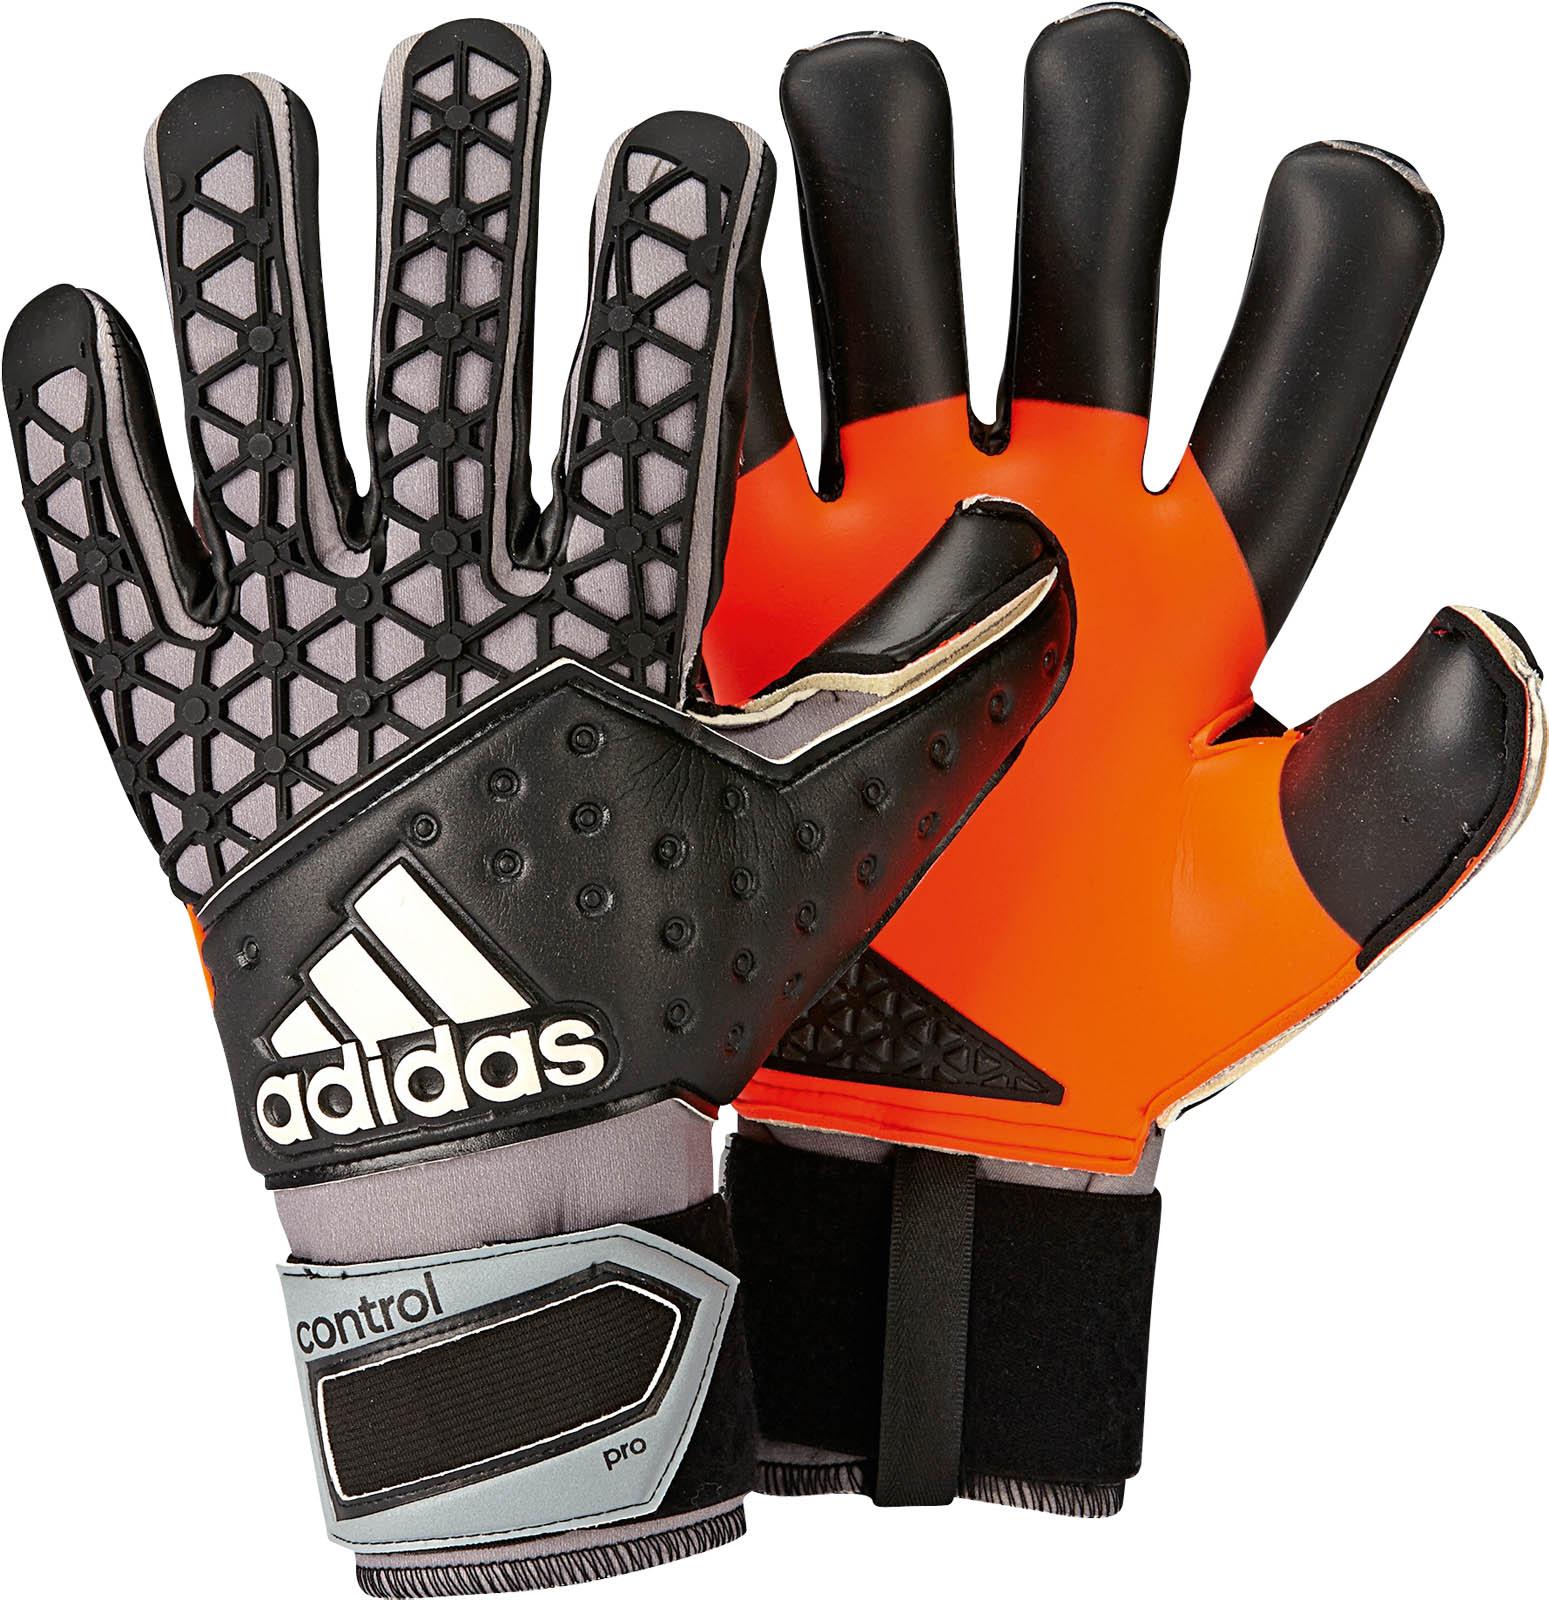 adidas ace zones iker casillas 2015 2016 goalkeeper gloves. Black Bedroom Furniture Sets. Home Design Ideas